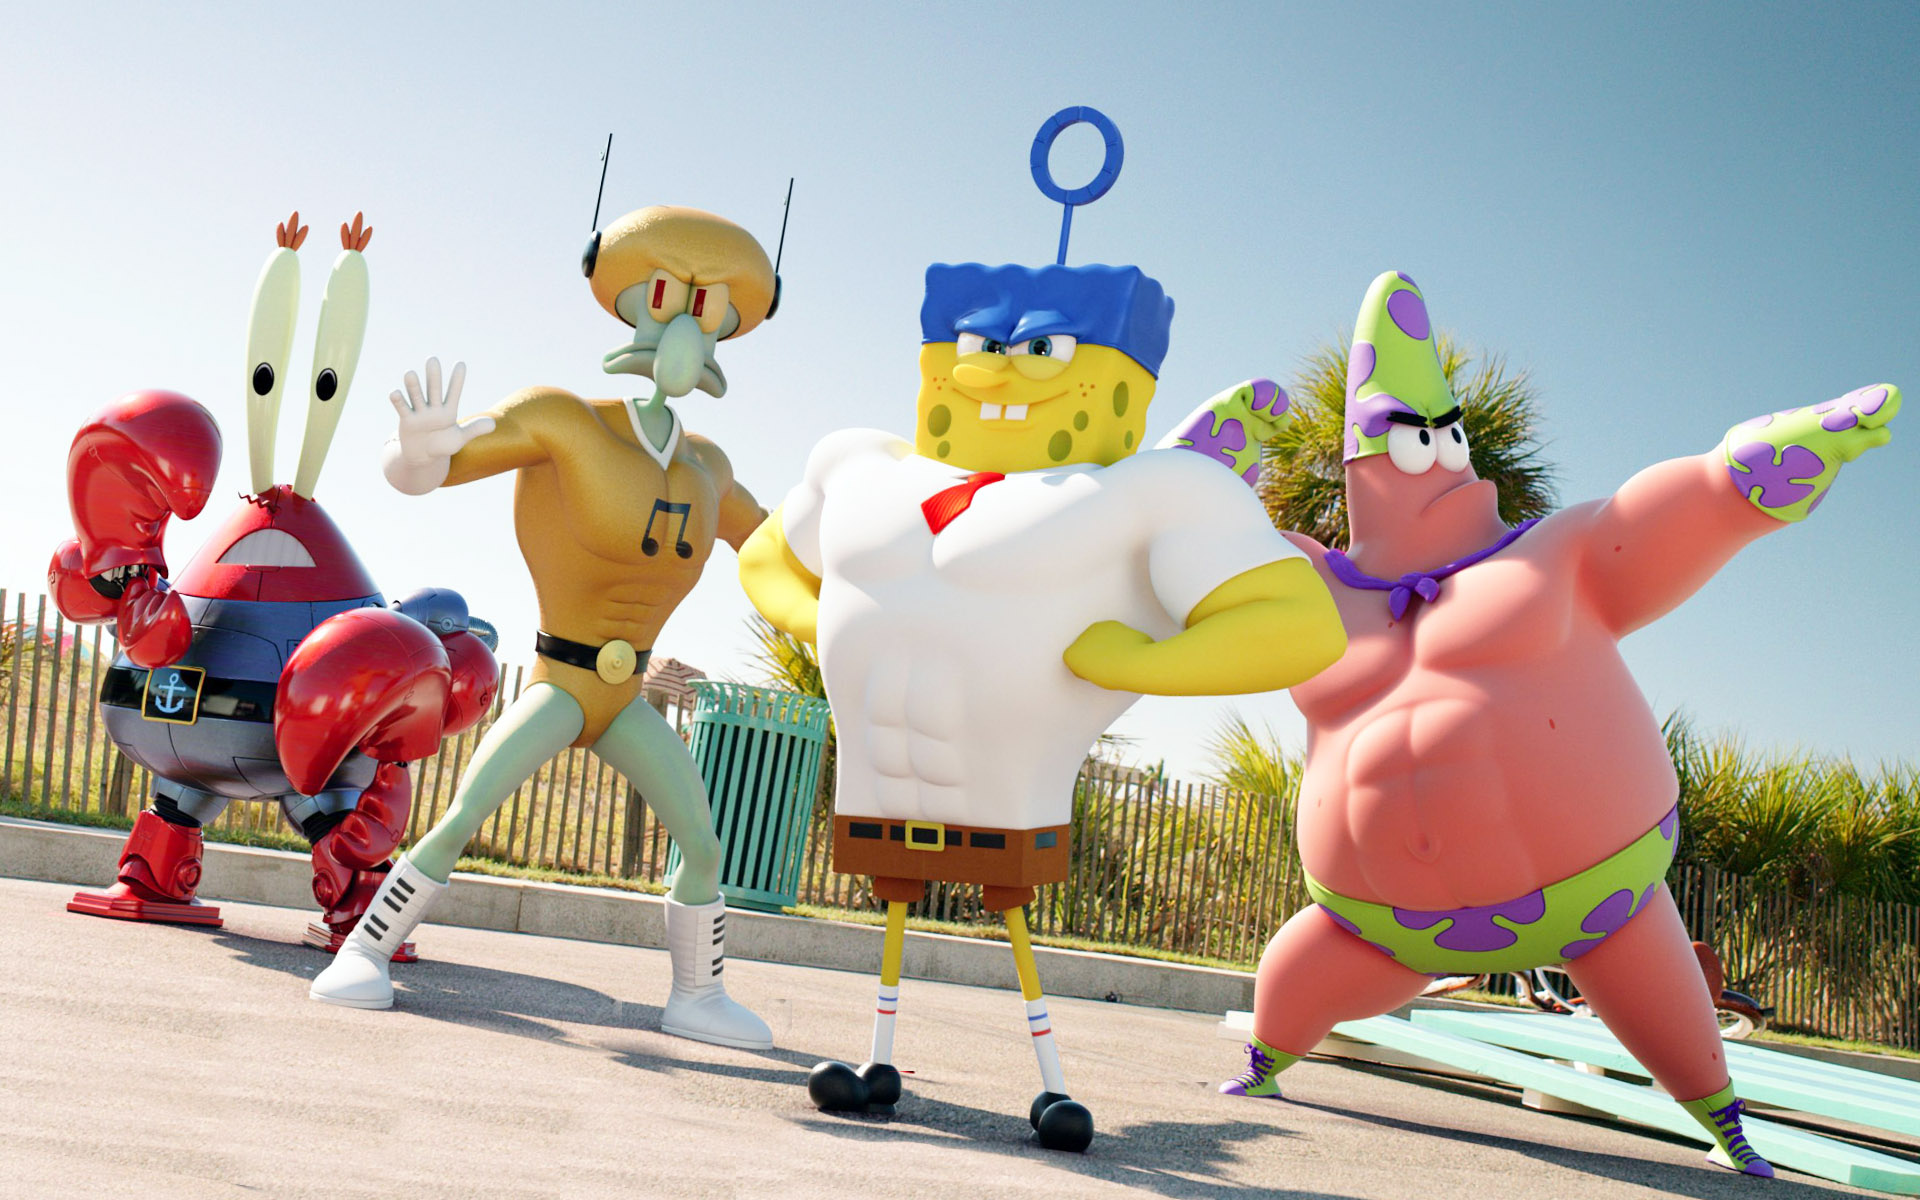 Spongebob Patrick Squidward And Mr Krabs Spongebob